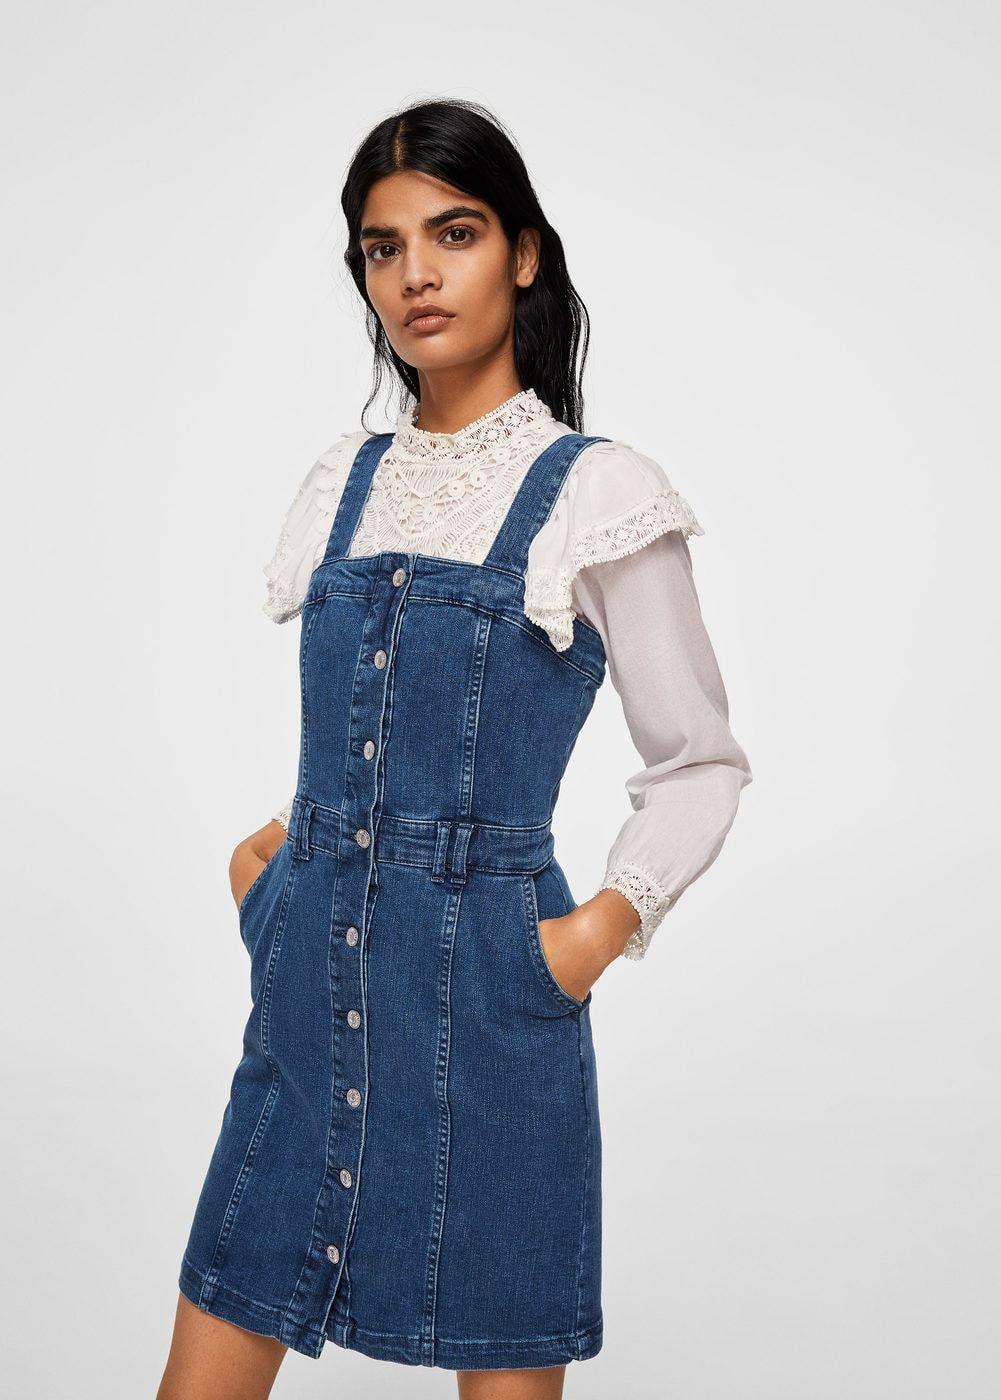 Pichi denim bolsillos - Vestidos de Mujer  5bc8d3263695